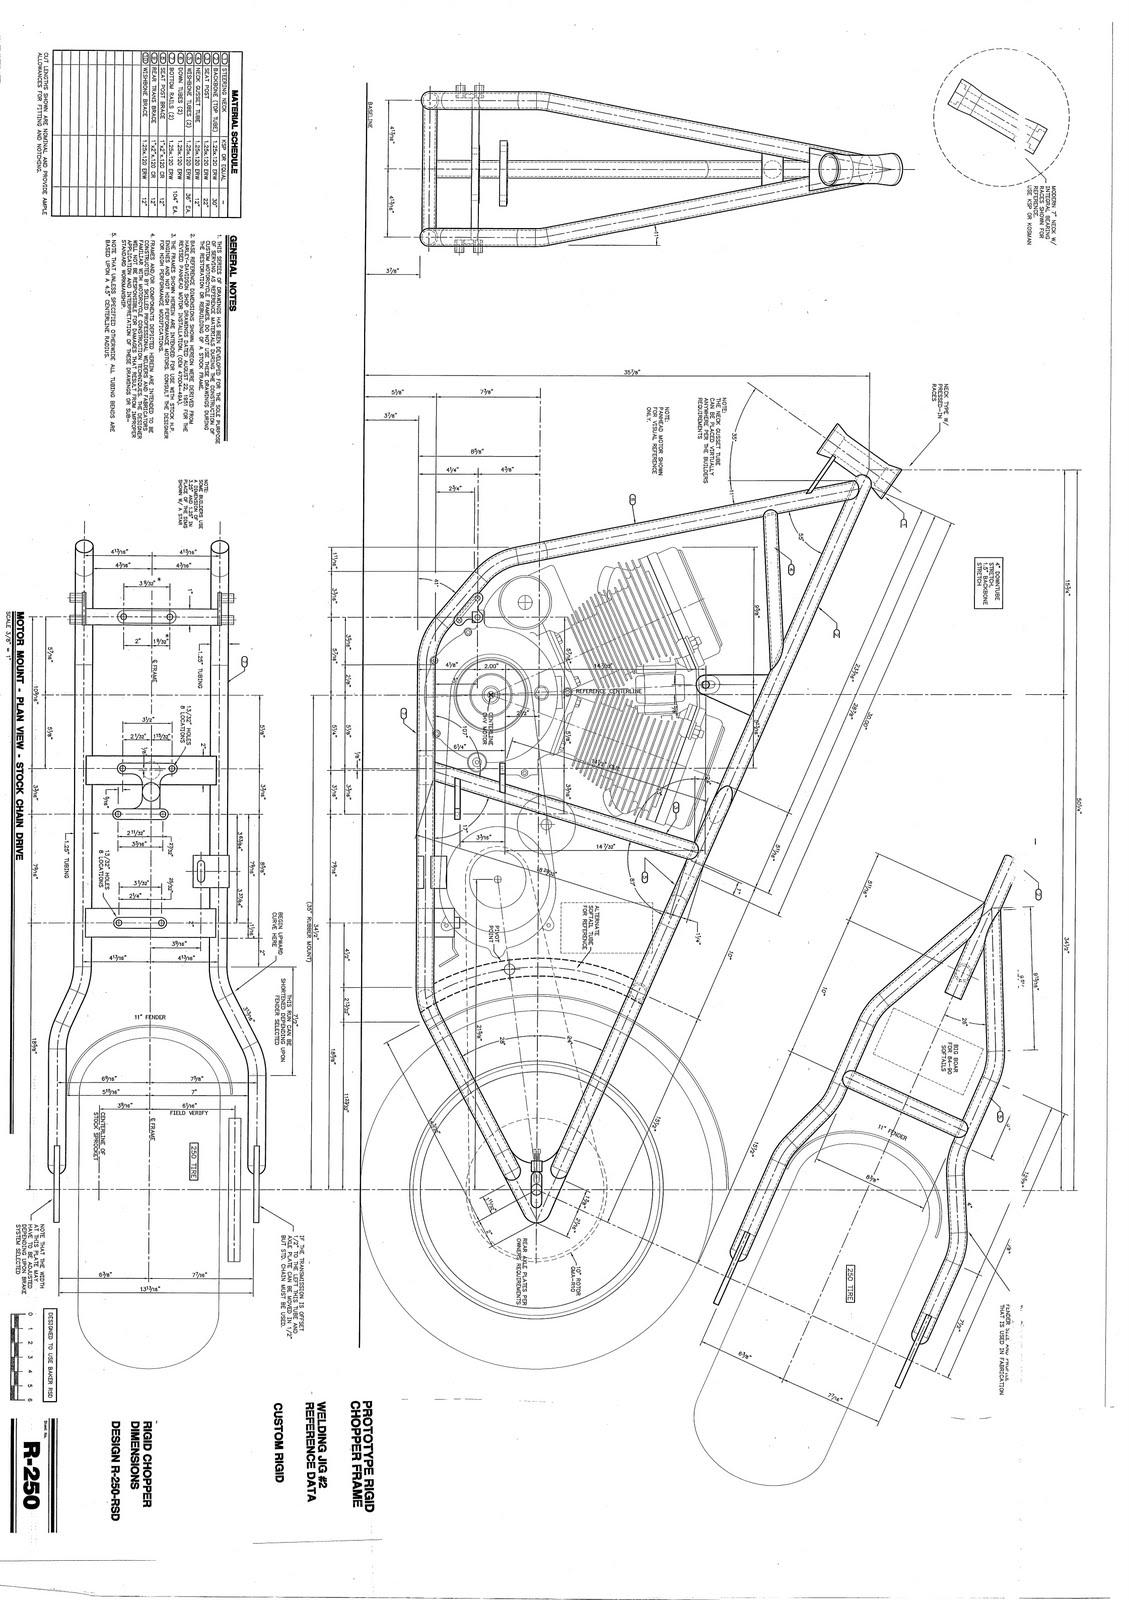 Page on Honda Cb750 Chopper Wiring Diagram